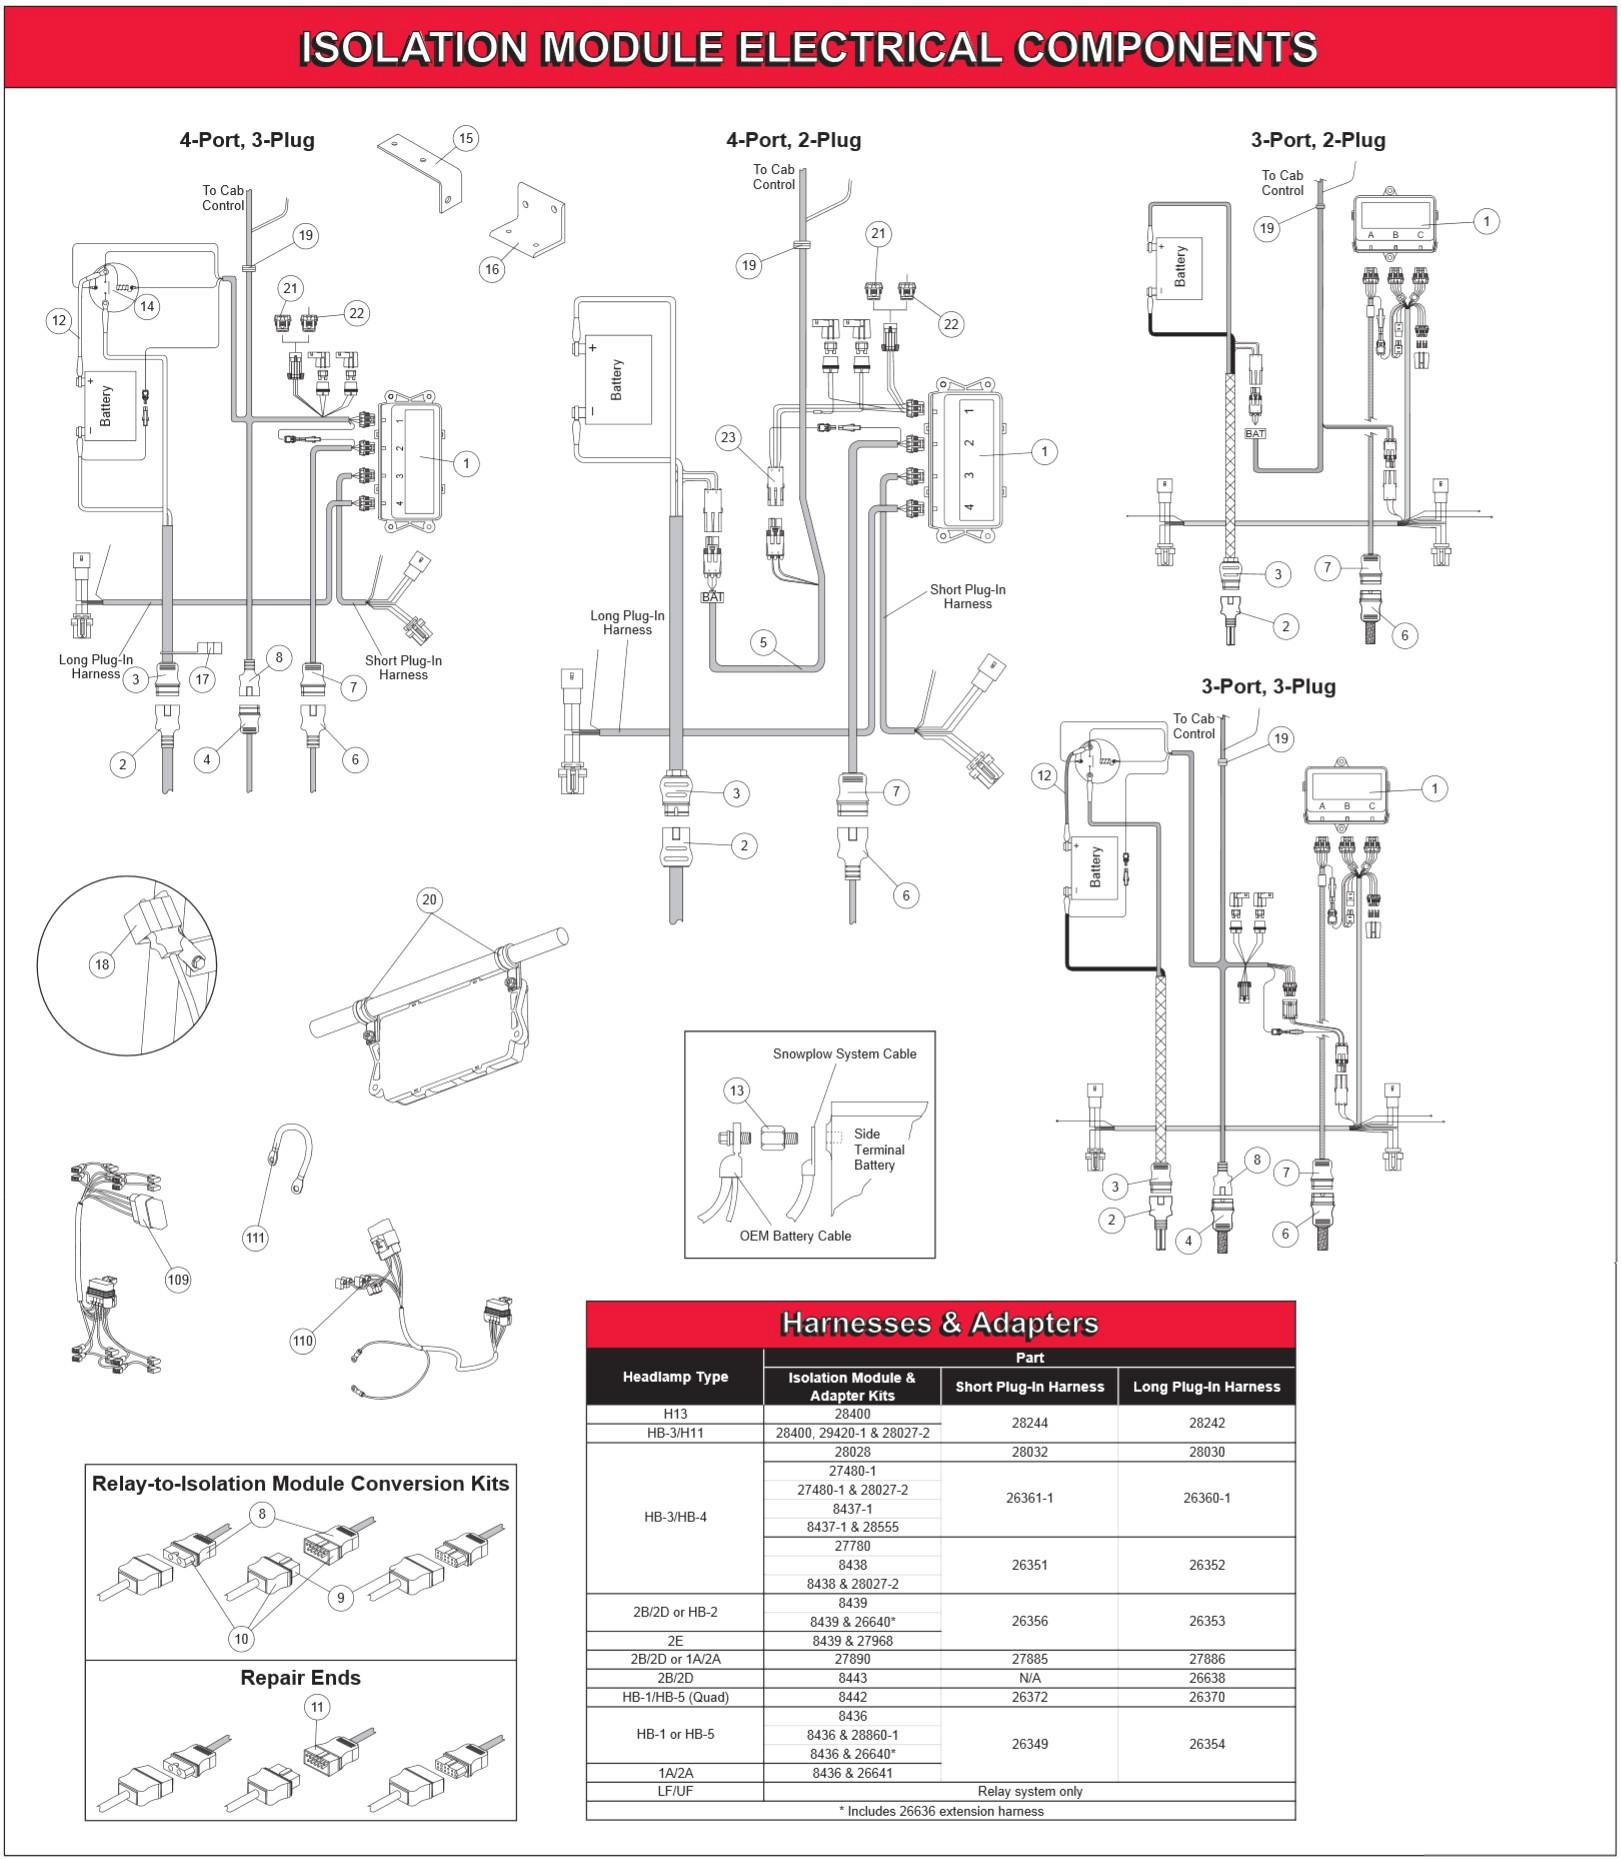 Meyer Bl 400 Wiring Diagram - Free Wiring Diagram For You • - Meyers Snow Plow Wiring Diagram